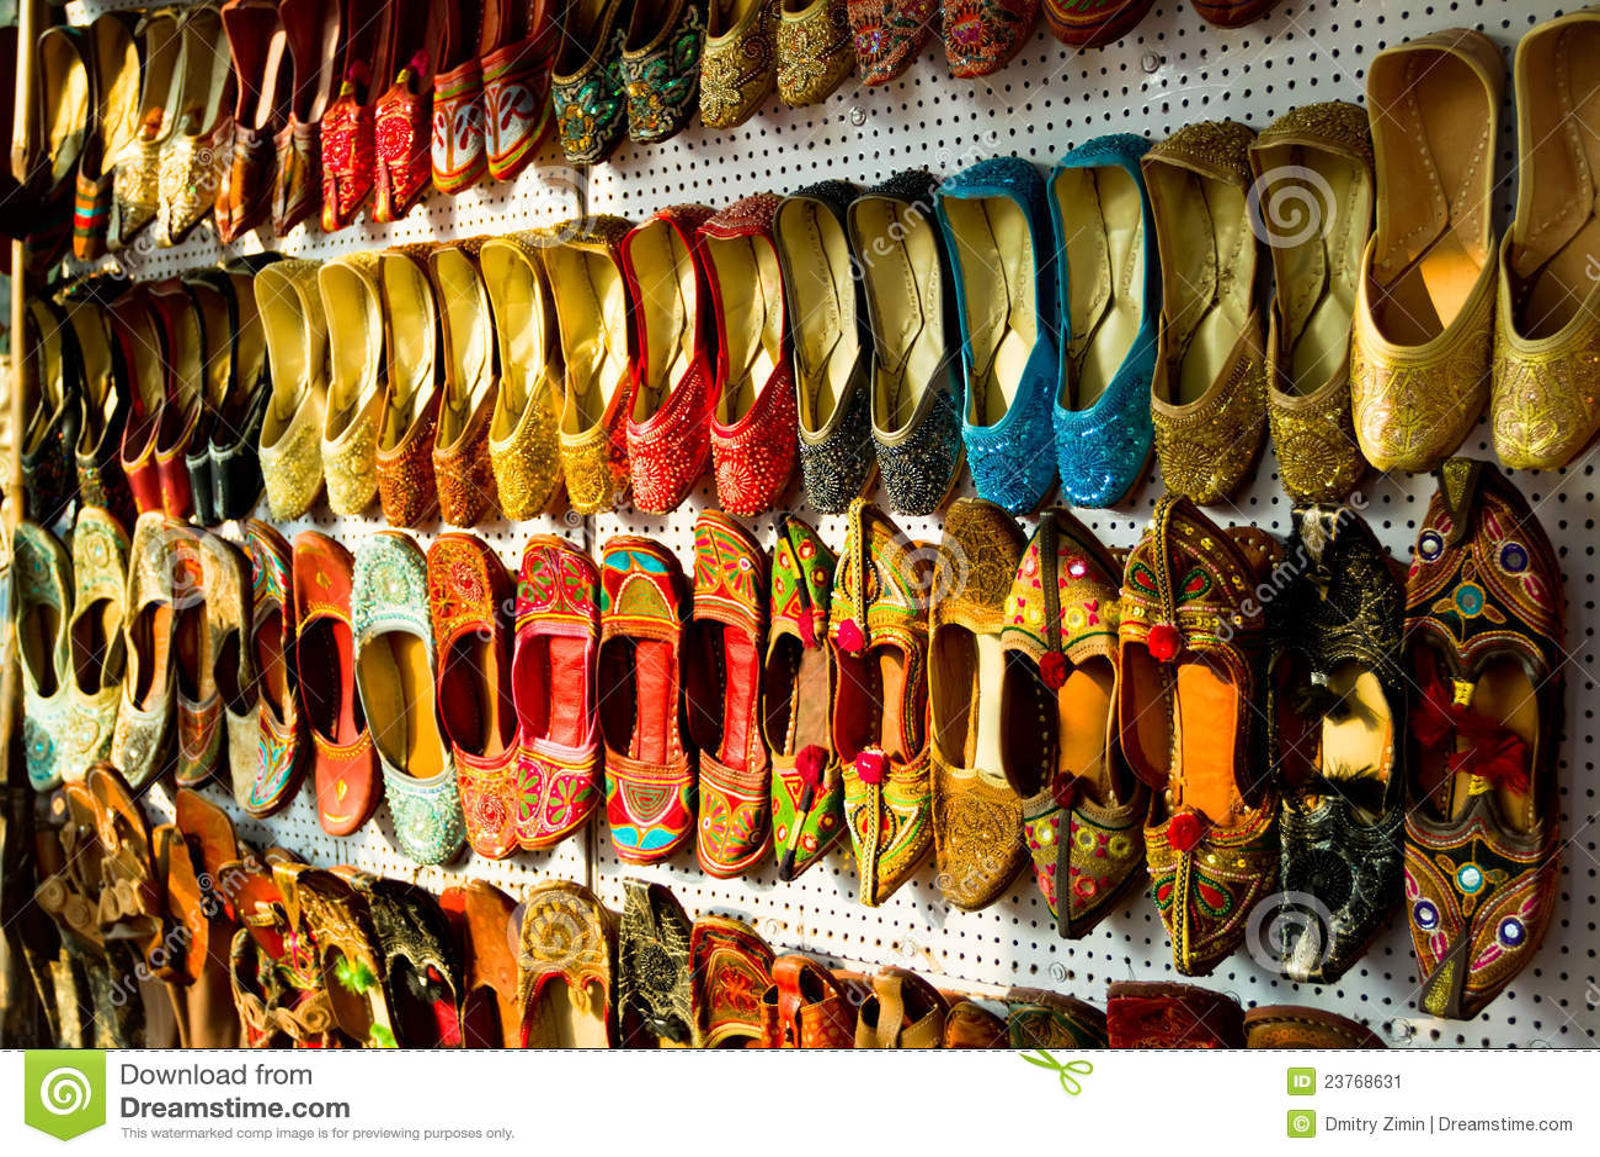 d0c5dd71100b ινδικά πολύχρωμα παπούτσια παραδοσιακά Στοκ Εικόνα - εικόνα από ...